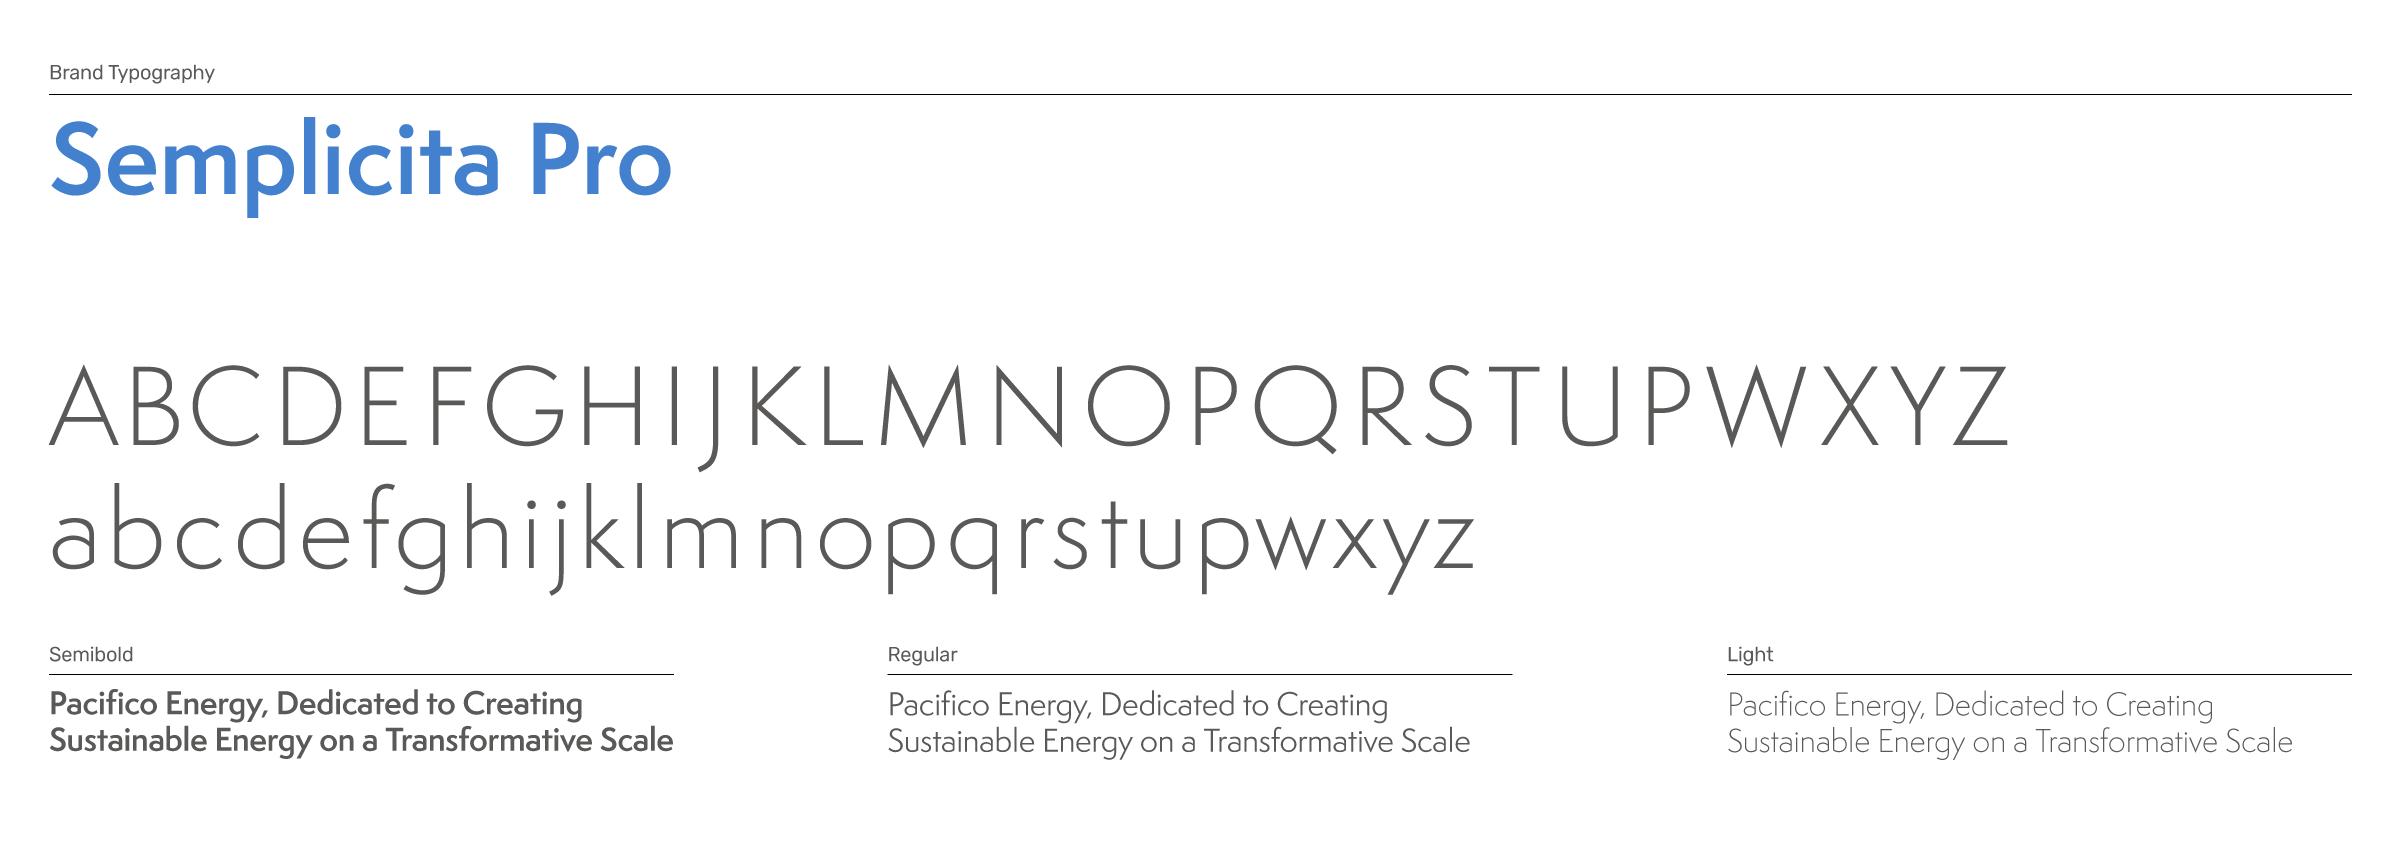 Pacifico Energy Brand Typography